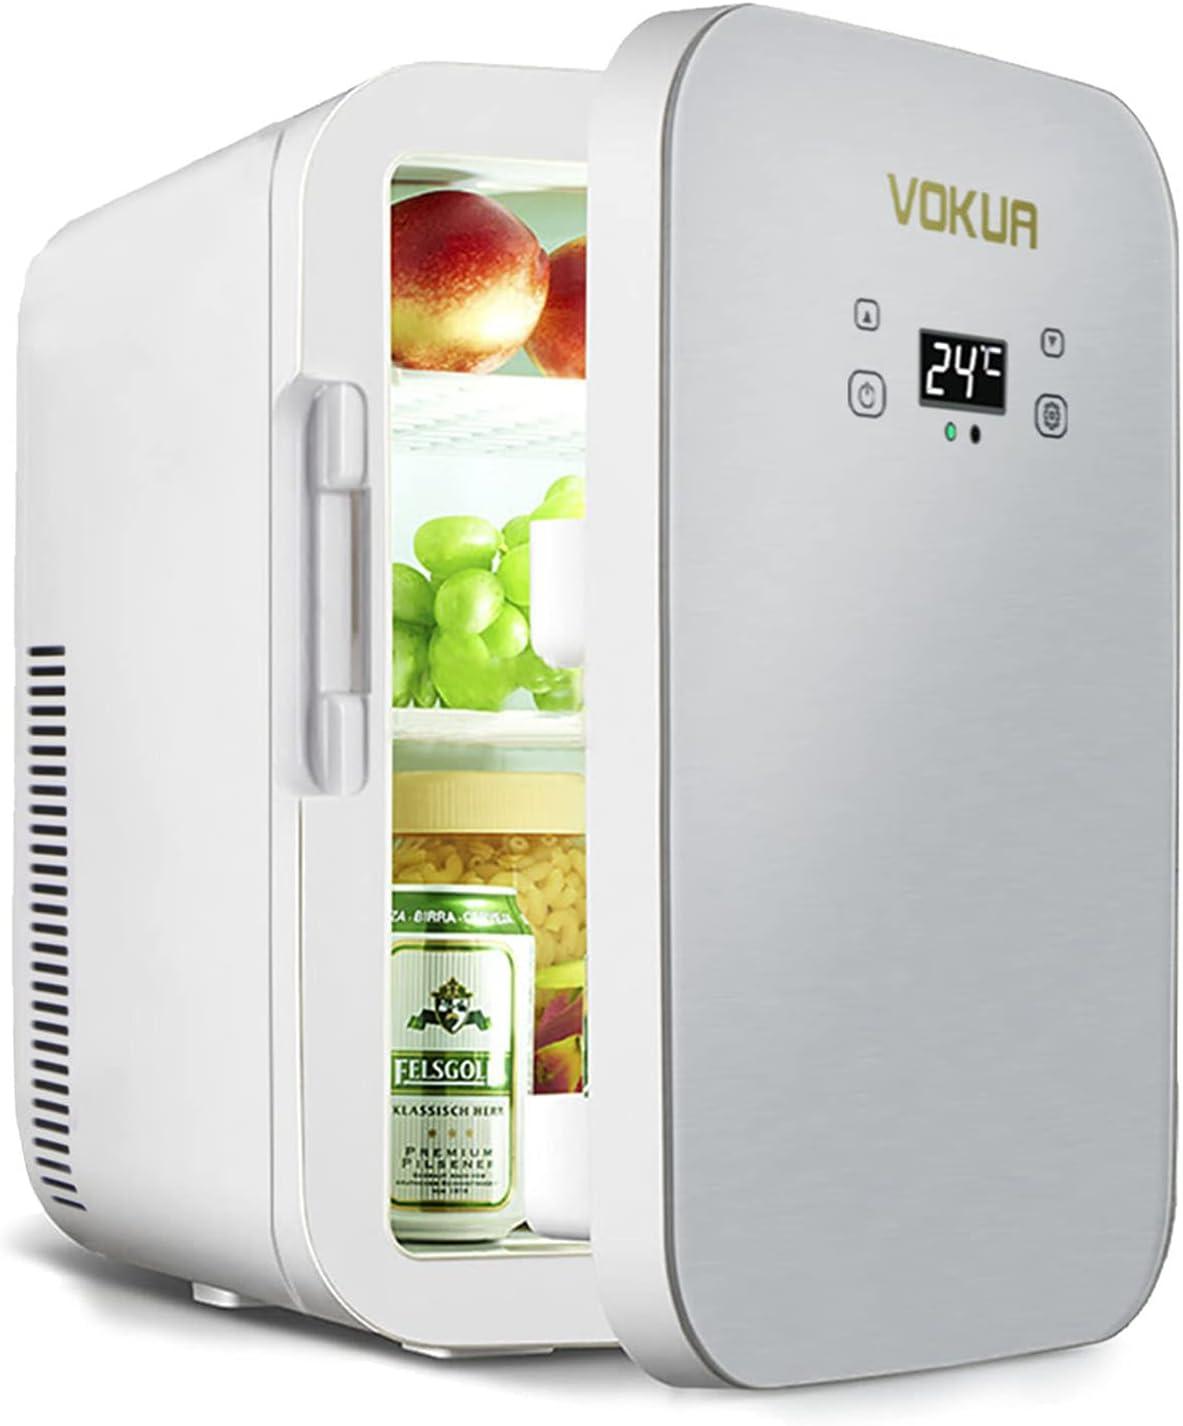 VOKUA 10 Liter Portable Mini Refrigerator